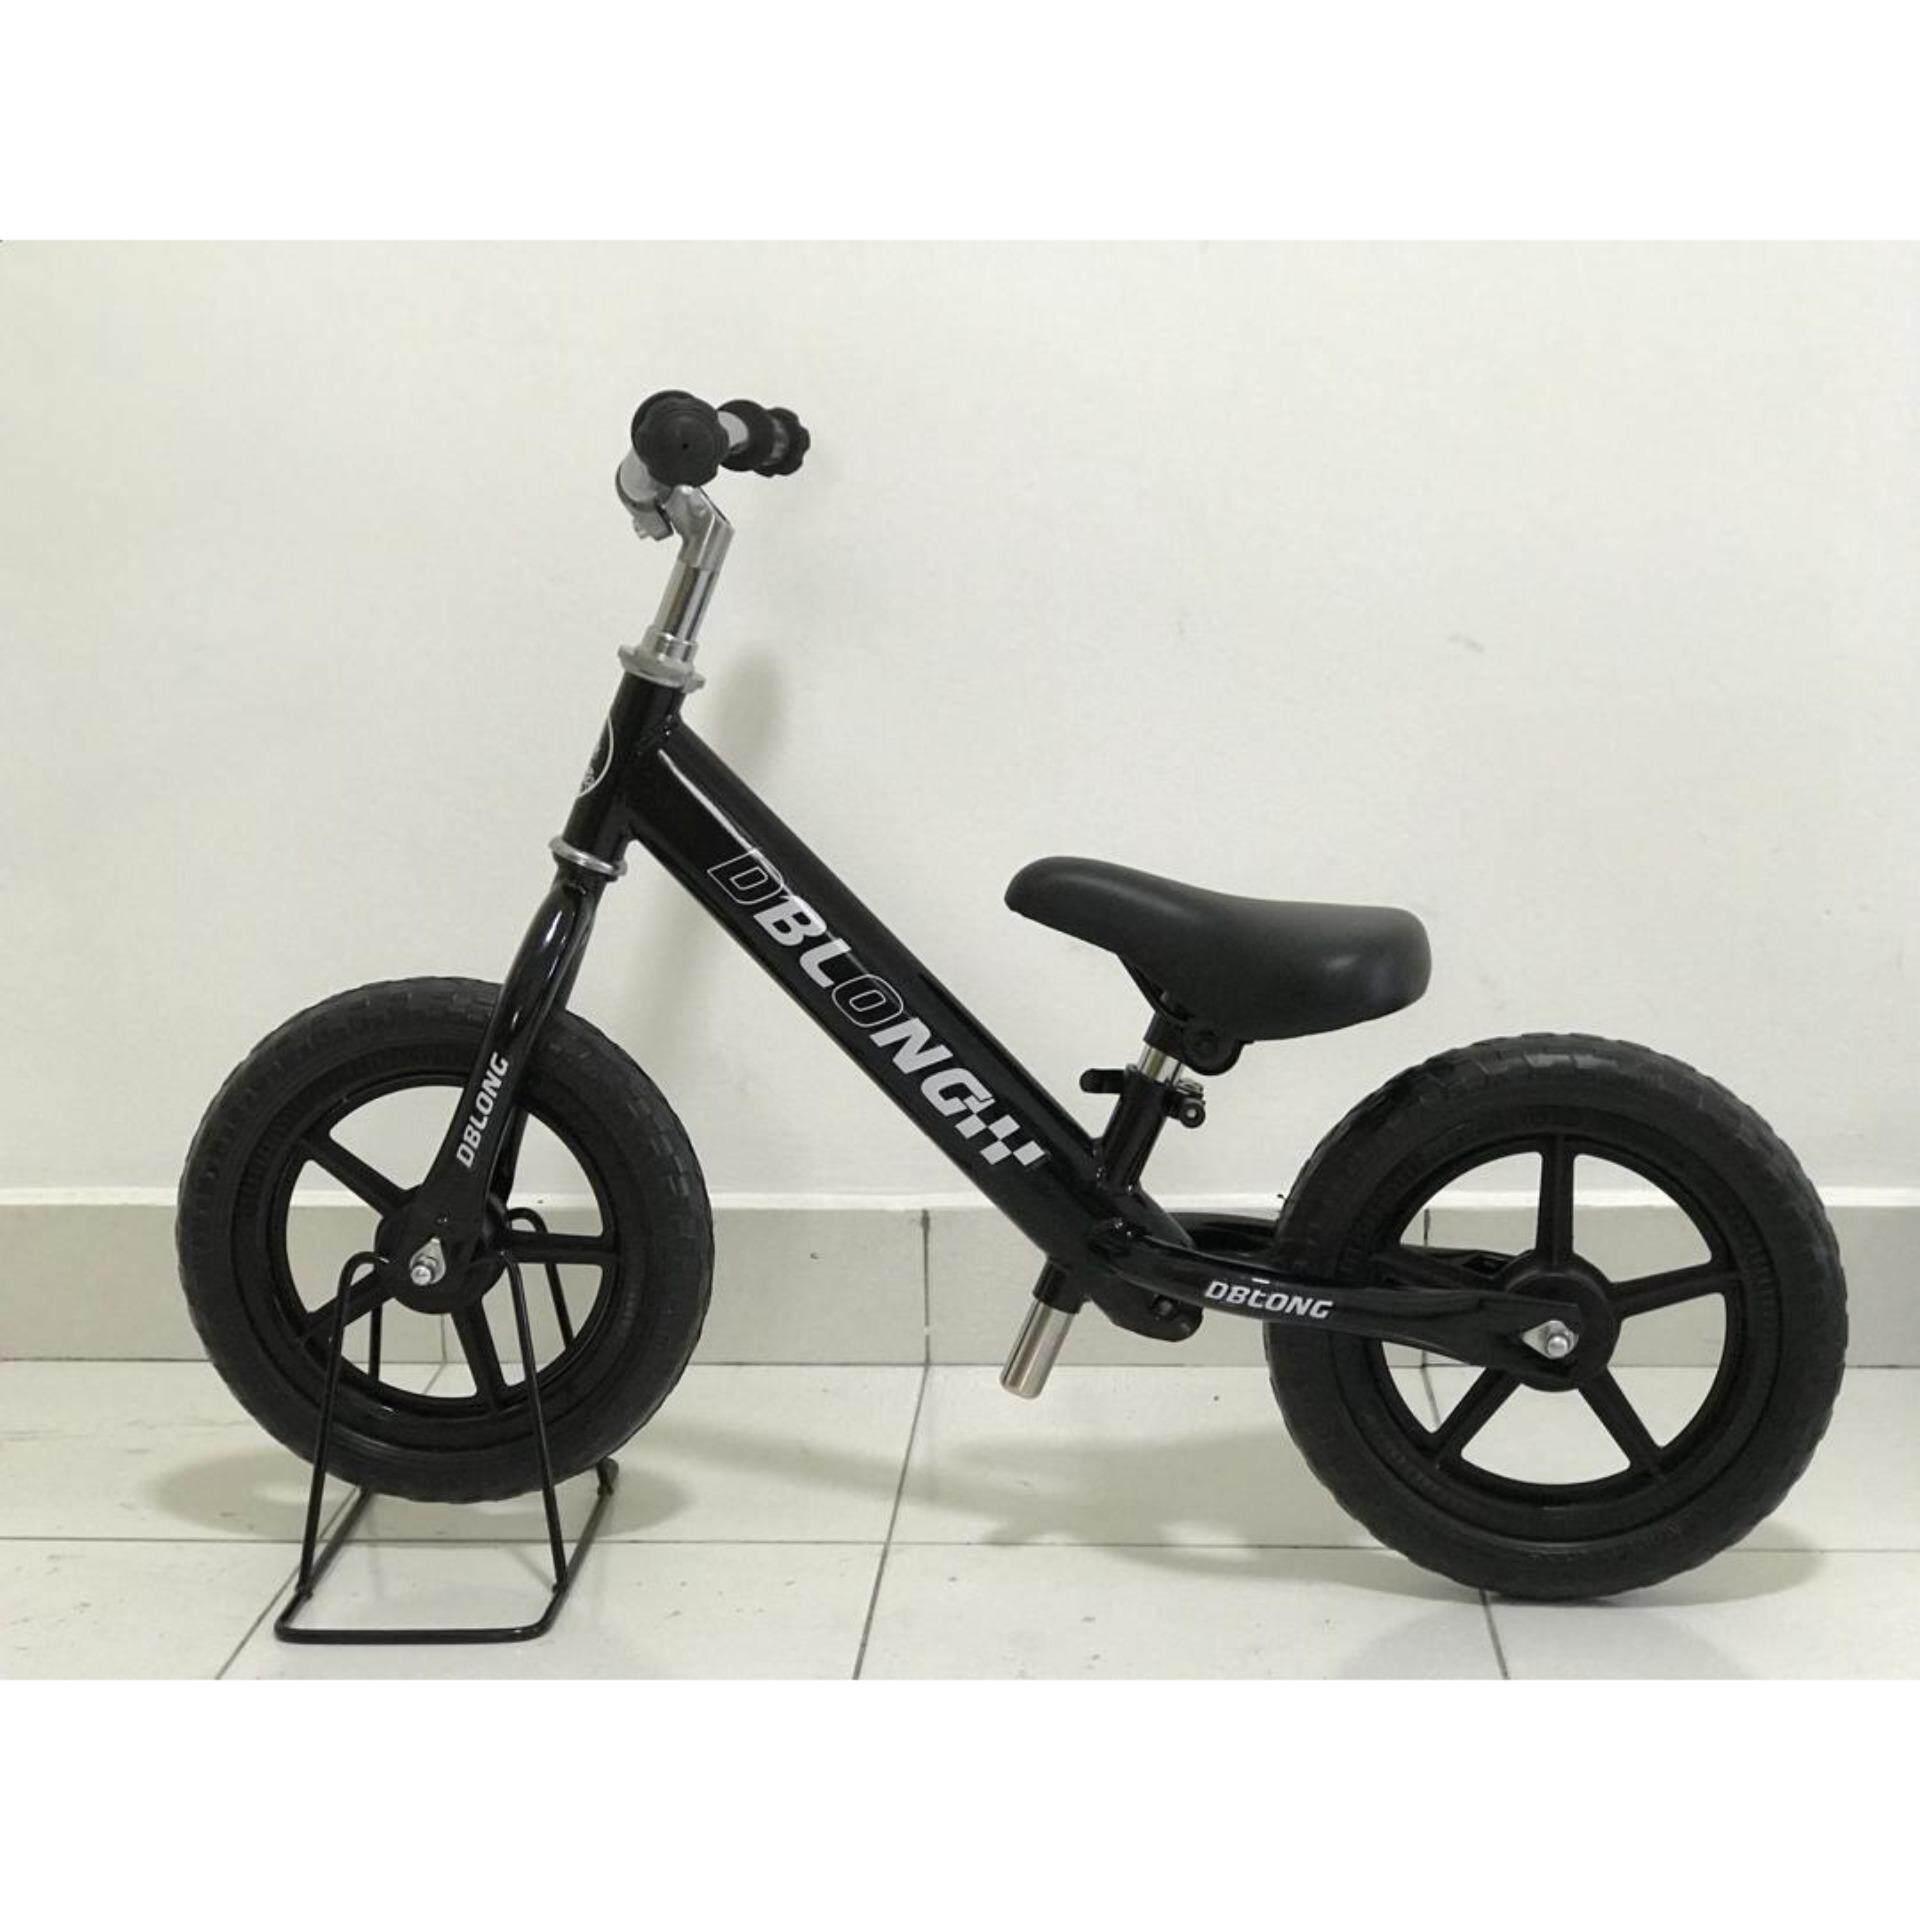 Dobilog / DBLong Kids Balance Bike / Push Bike / No Pedal Bike (Steel Frame)